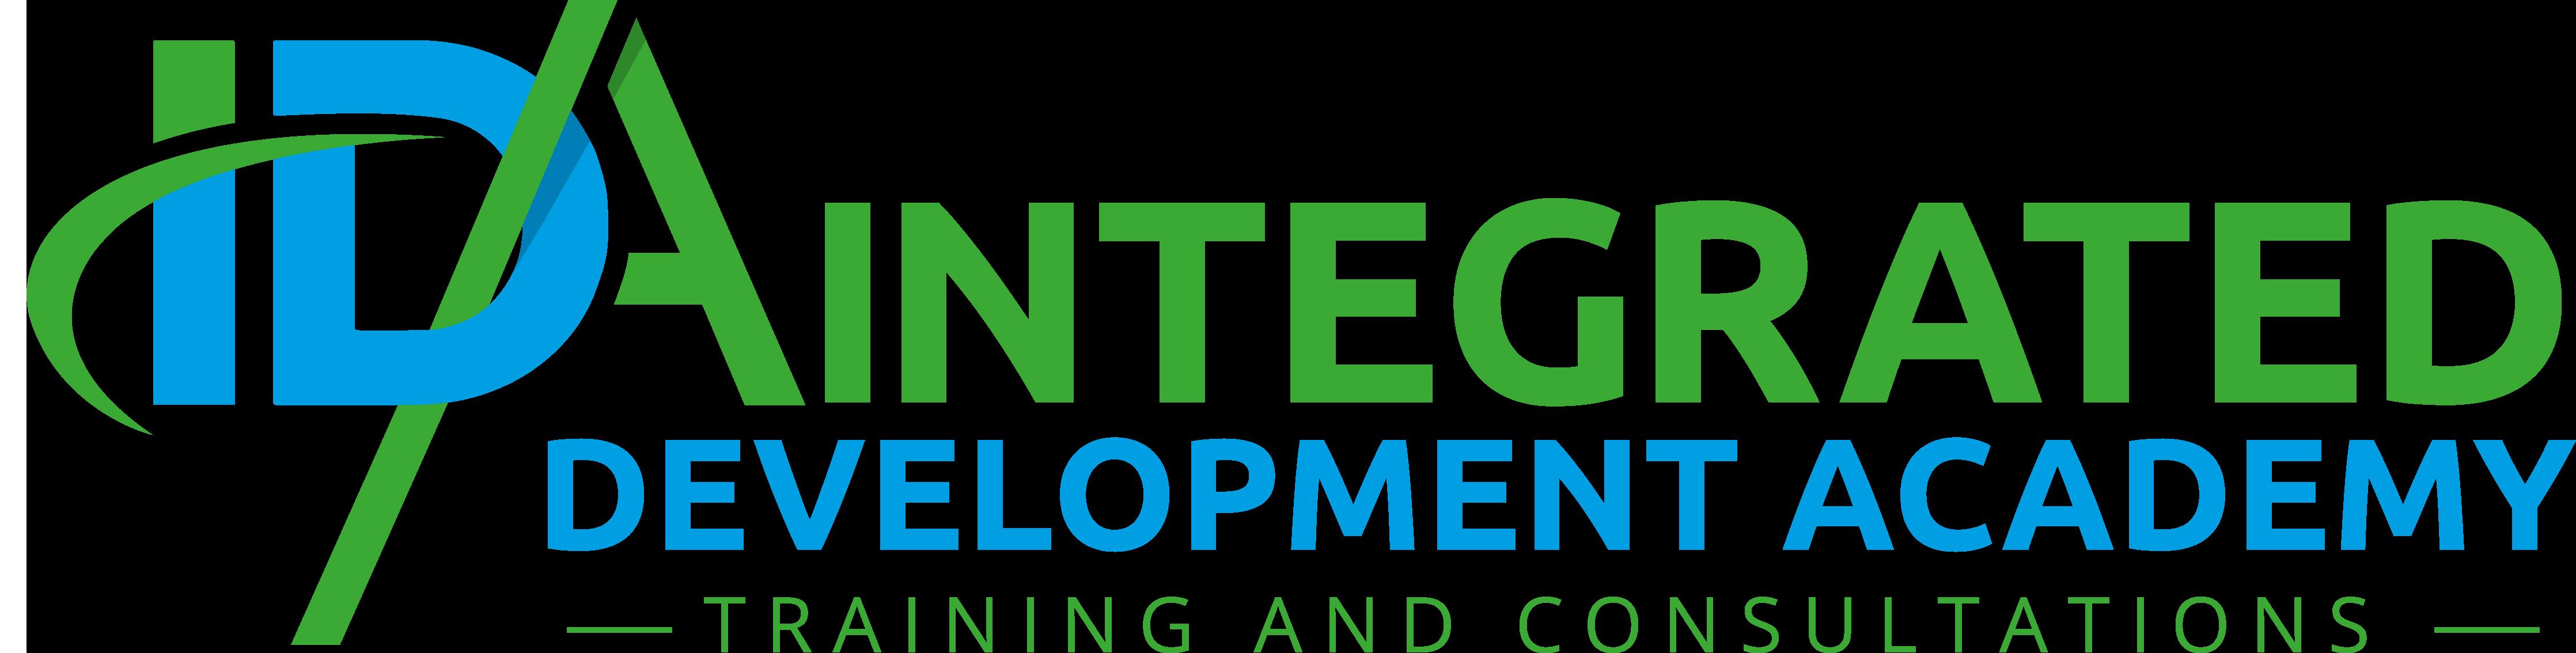 Integrated Development Academy logo